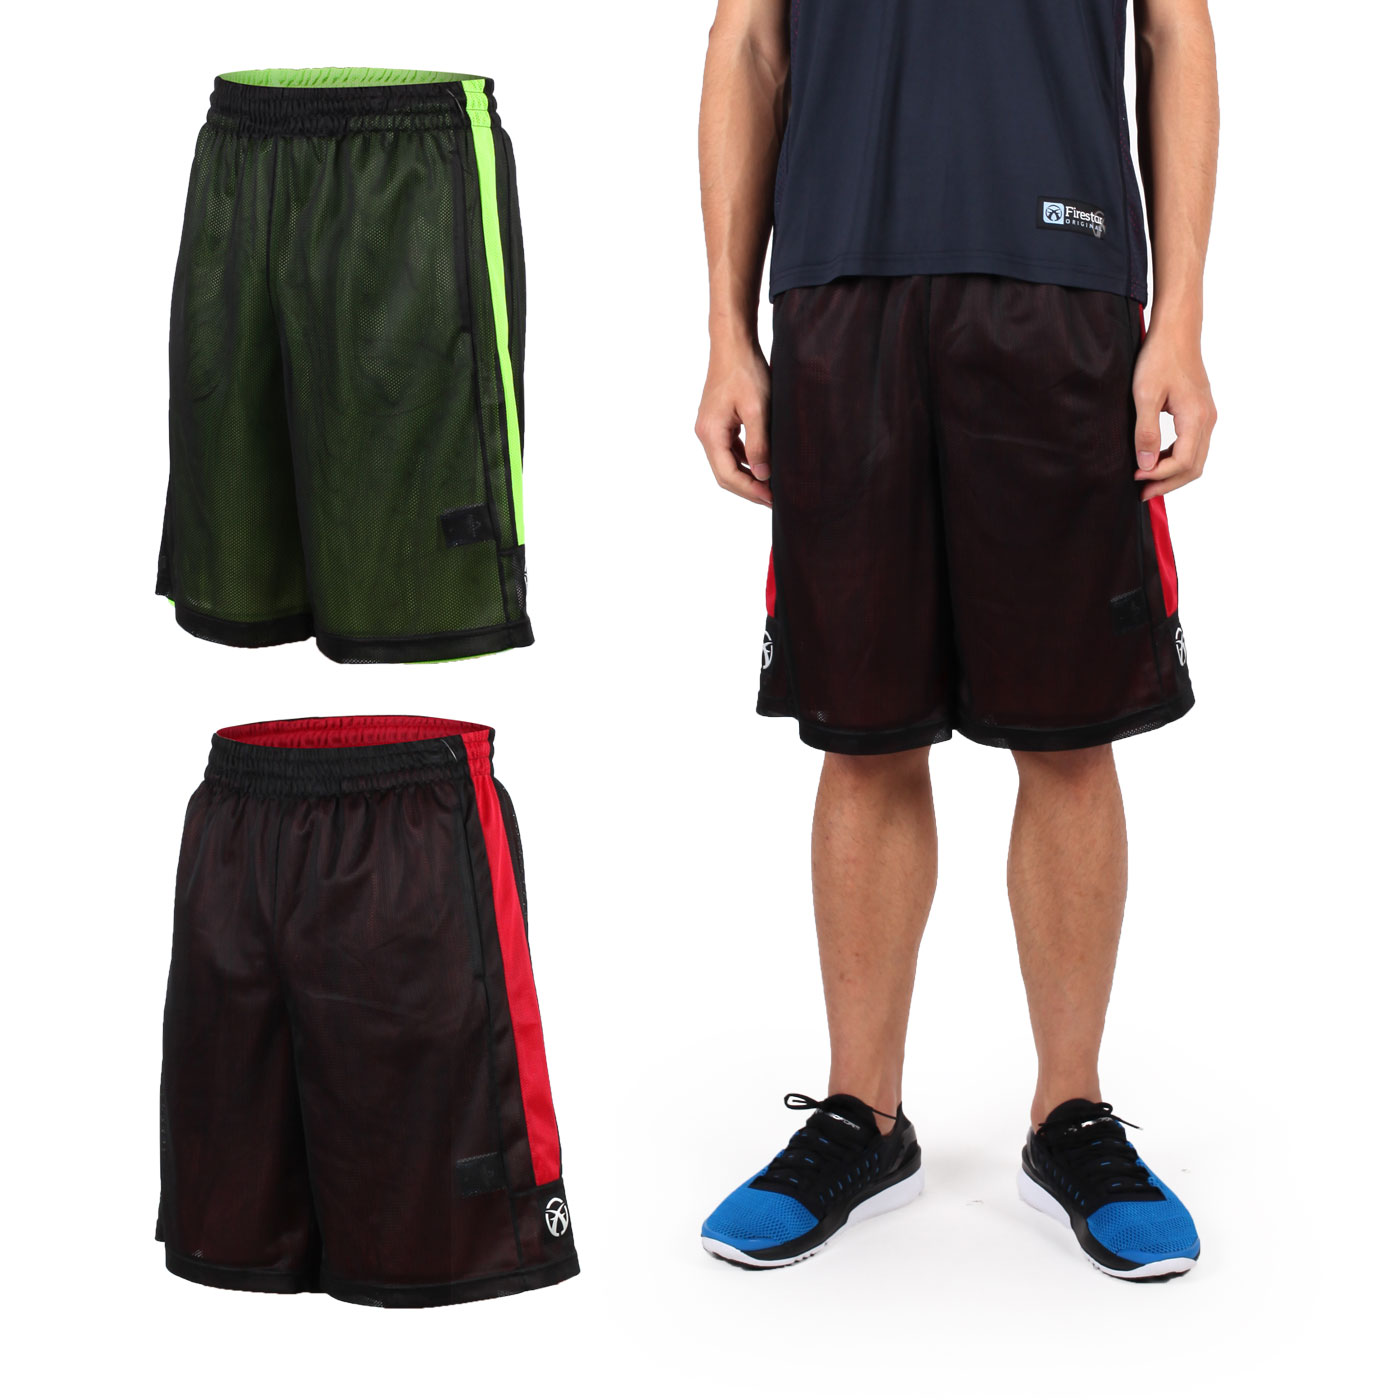 FIRESTAR 男雙面網布籃球褲 B6306-10